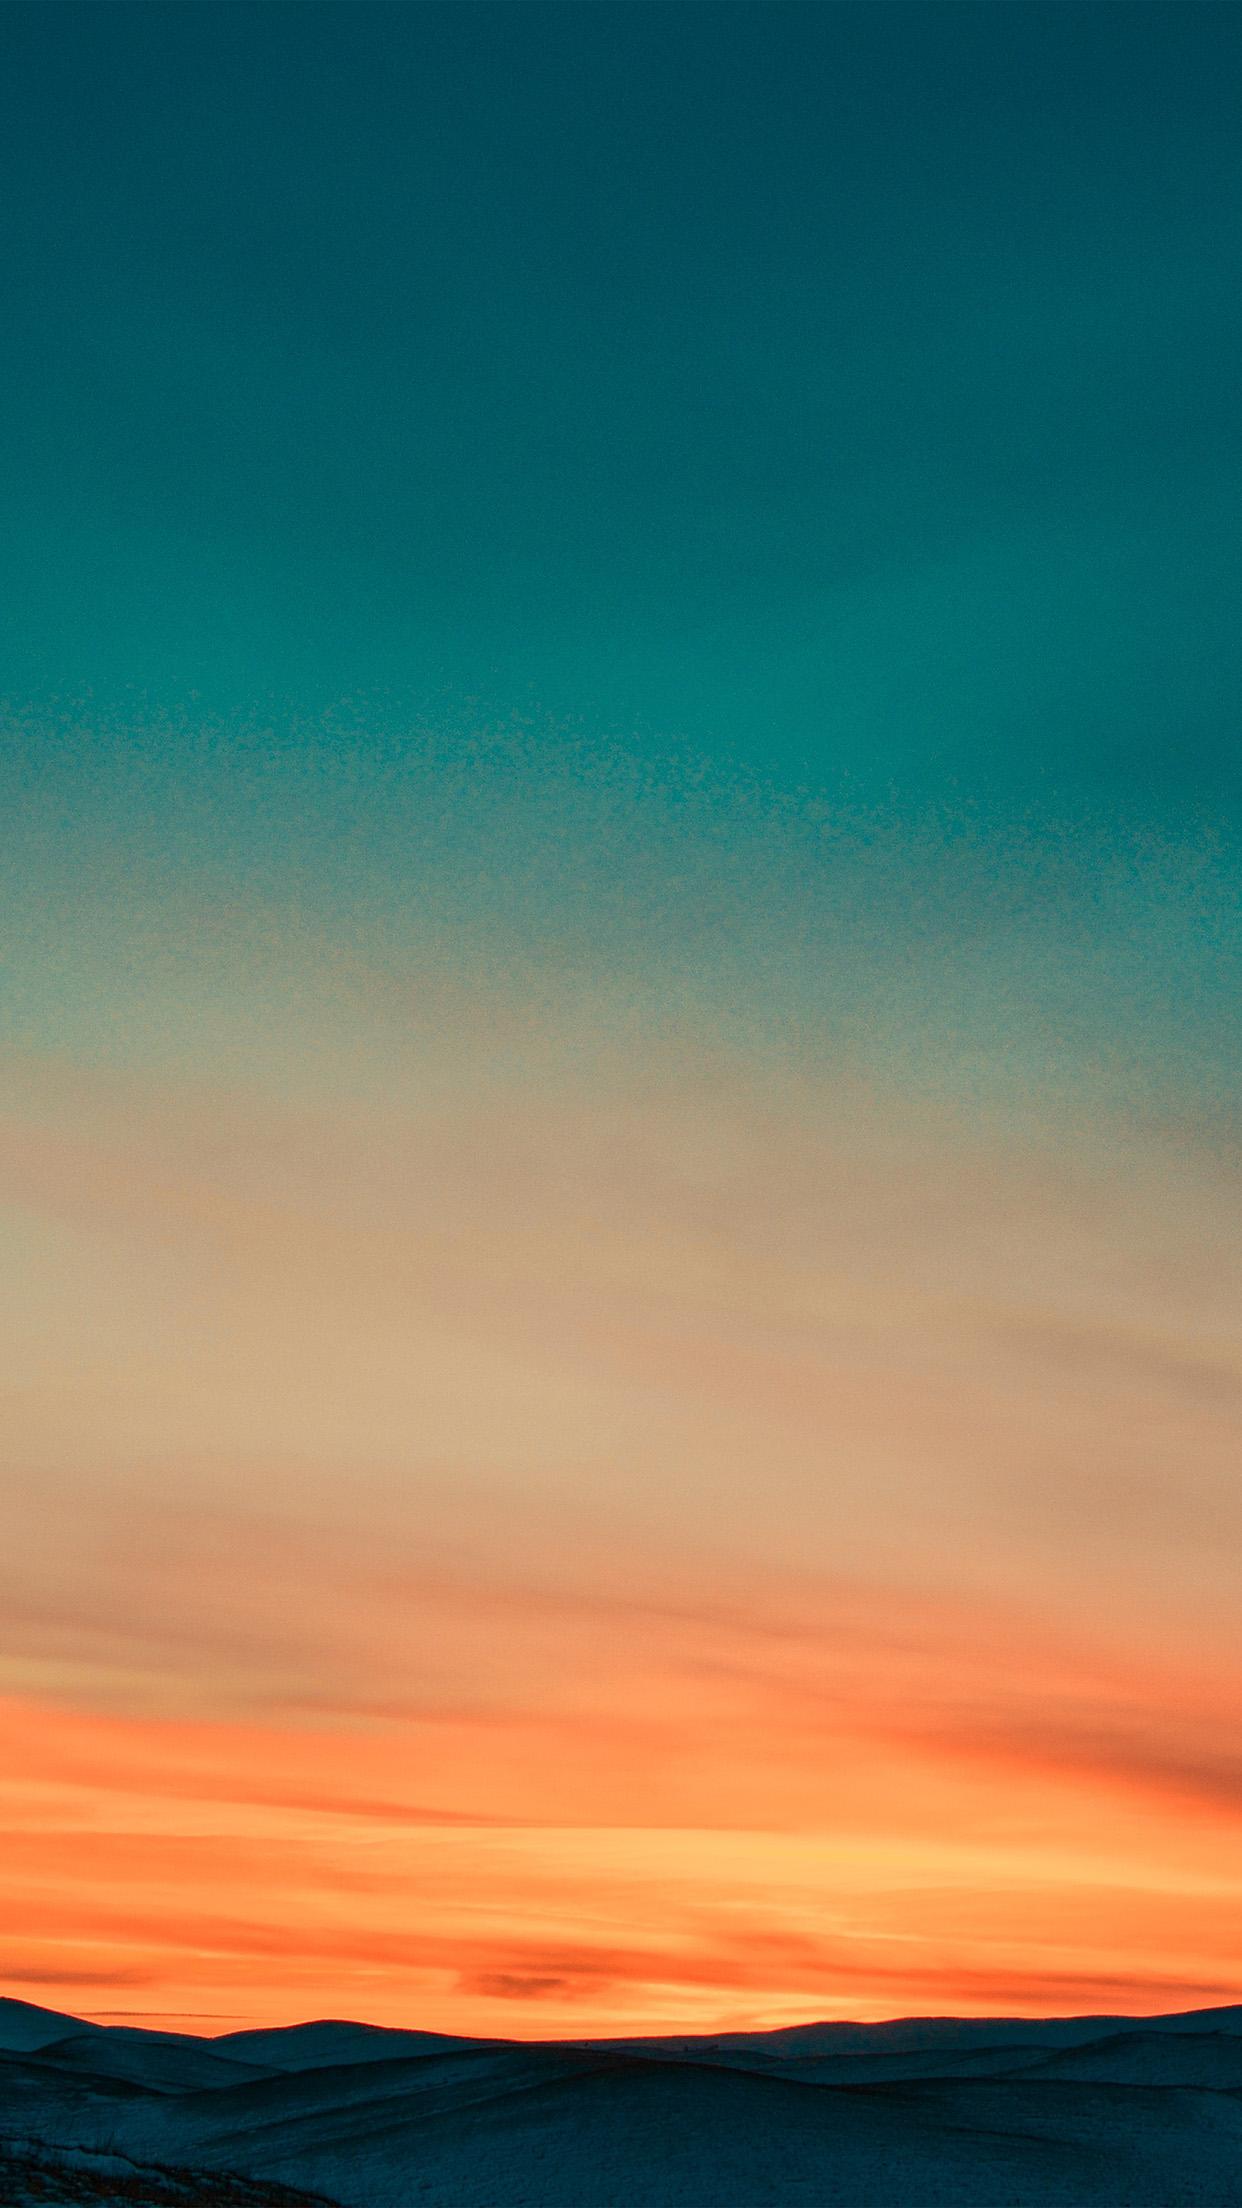 Free Fall Desktop Wallpaper For Mac Papers Co Iphone Wallpaper Nb66 Sky Sunset Nature